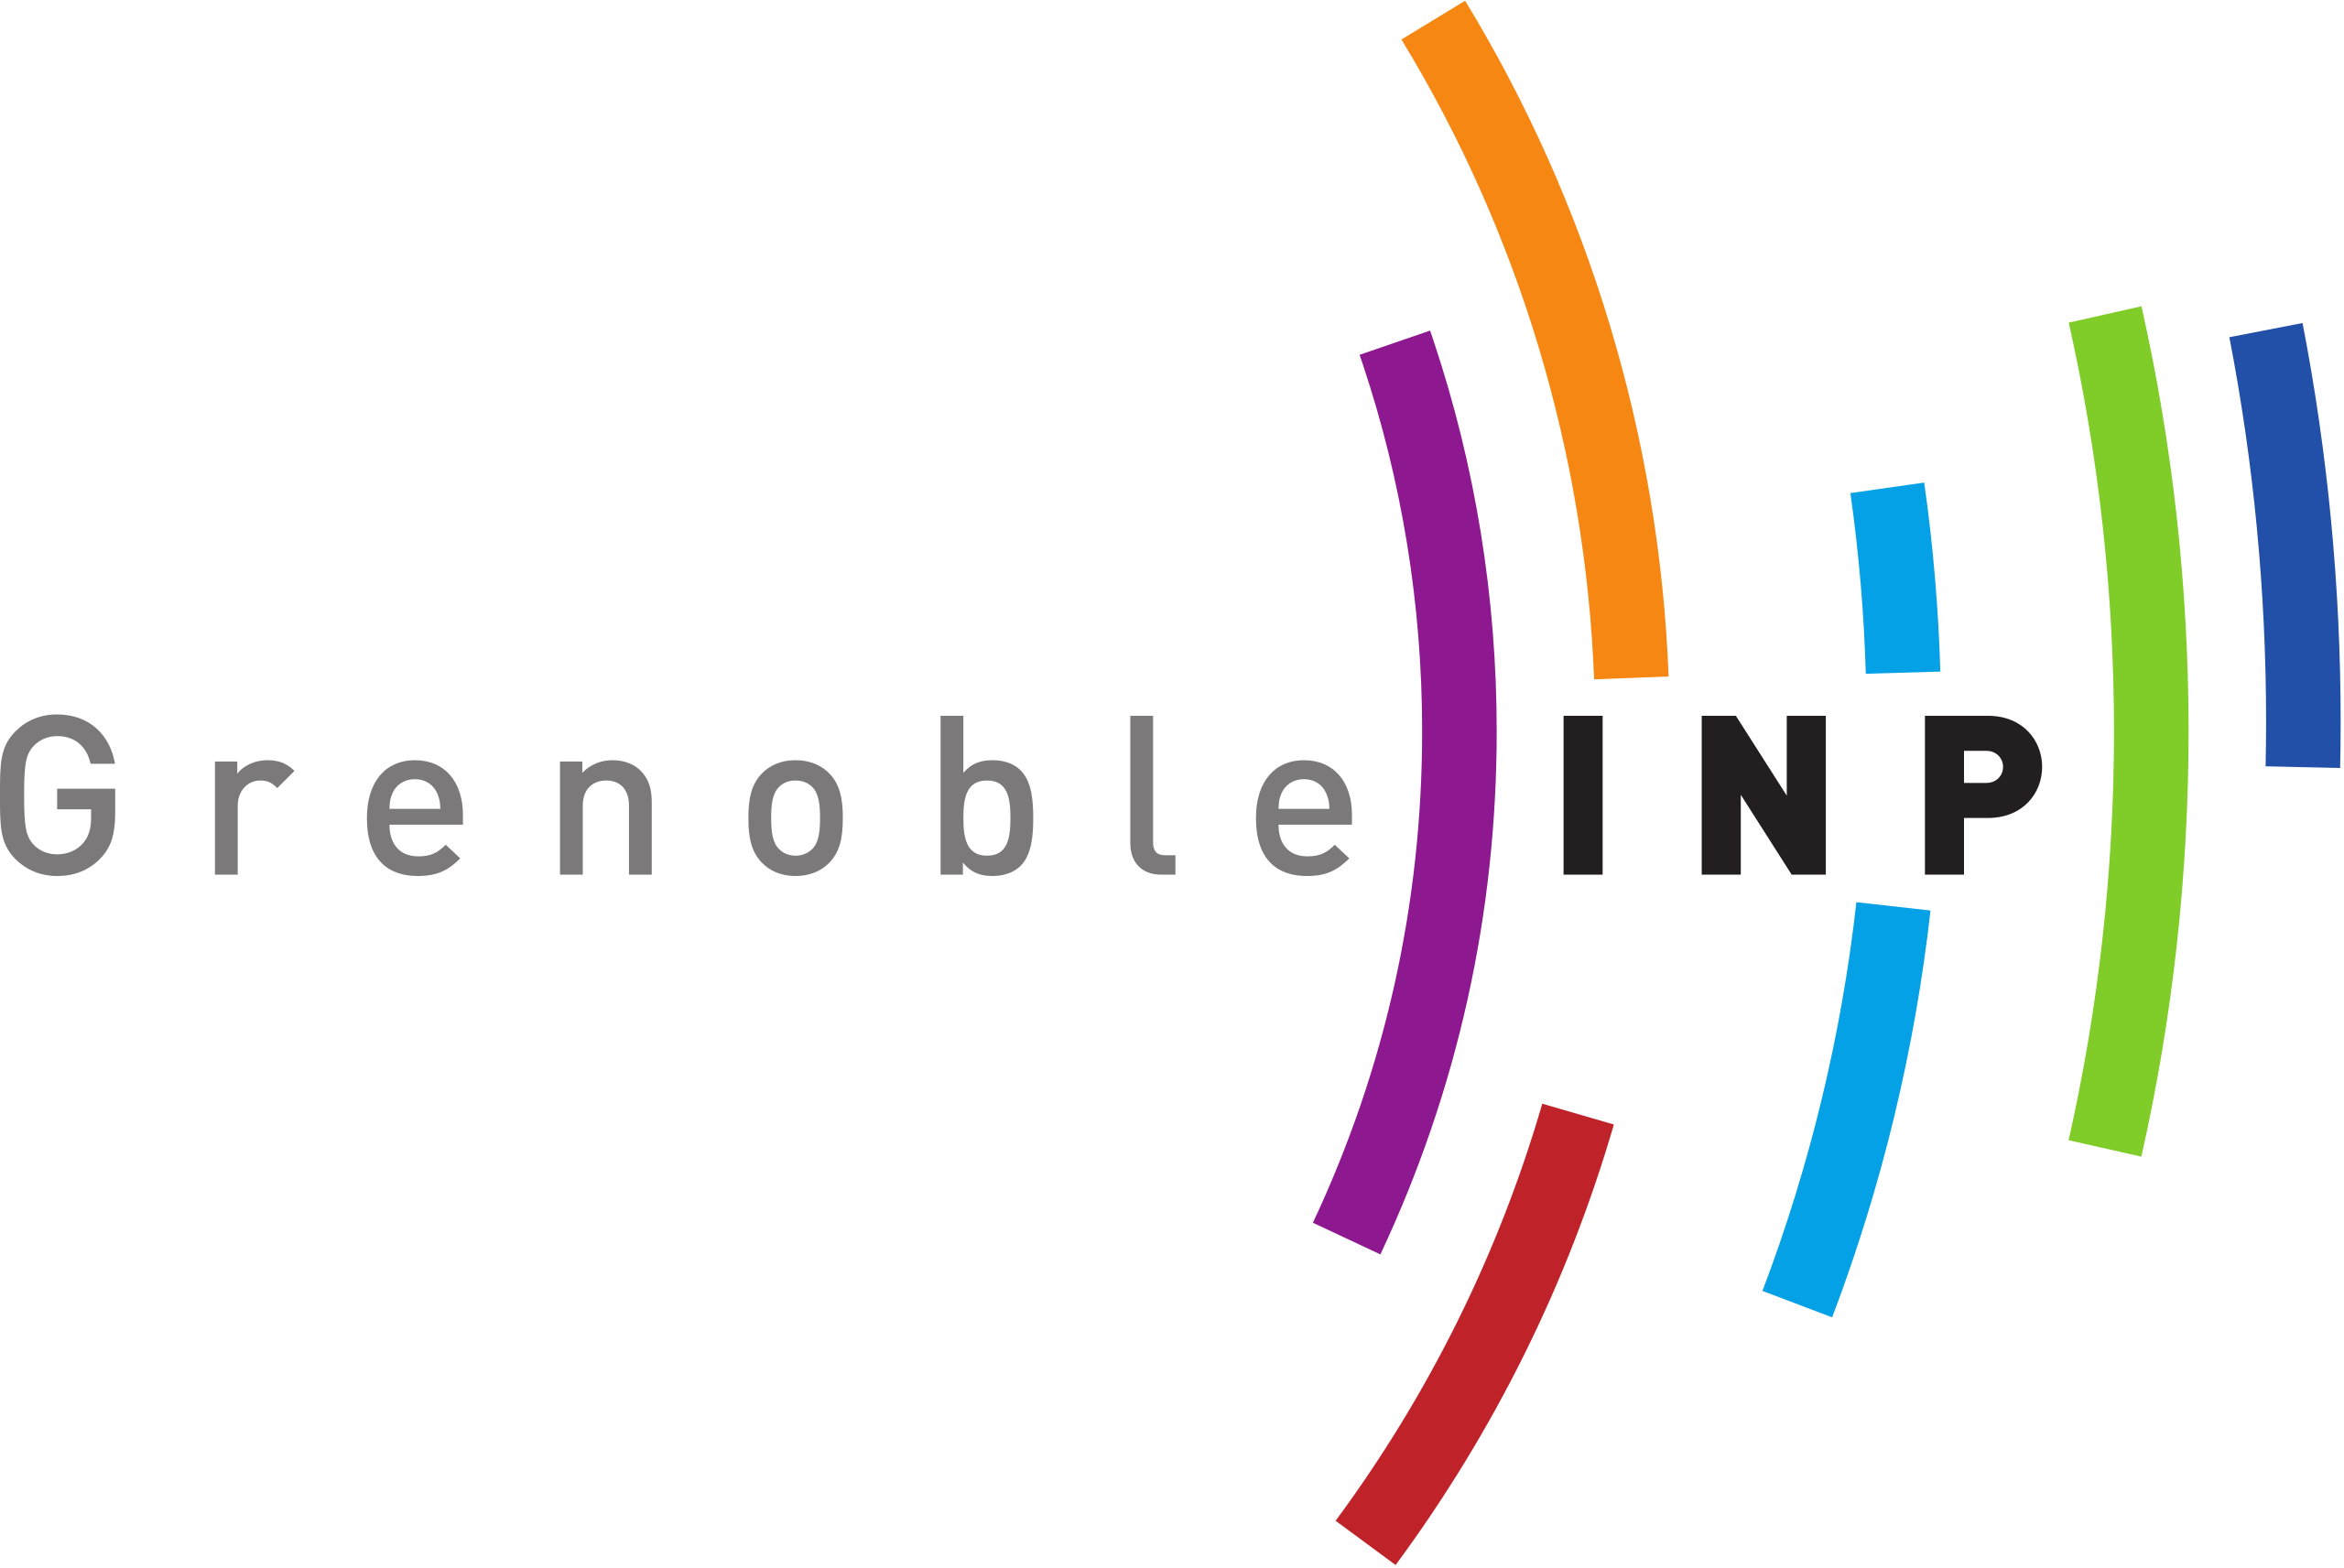 logo_ginp.png